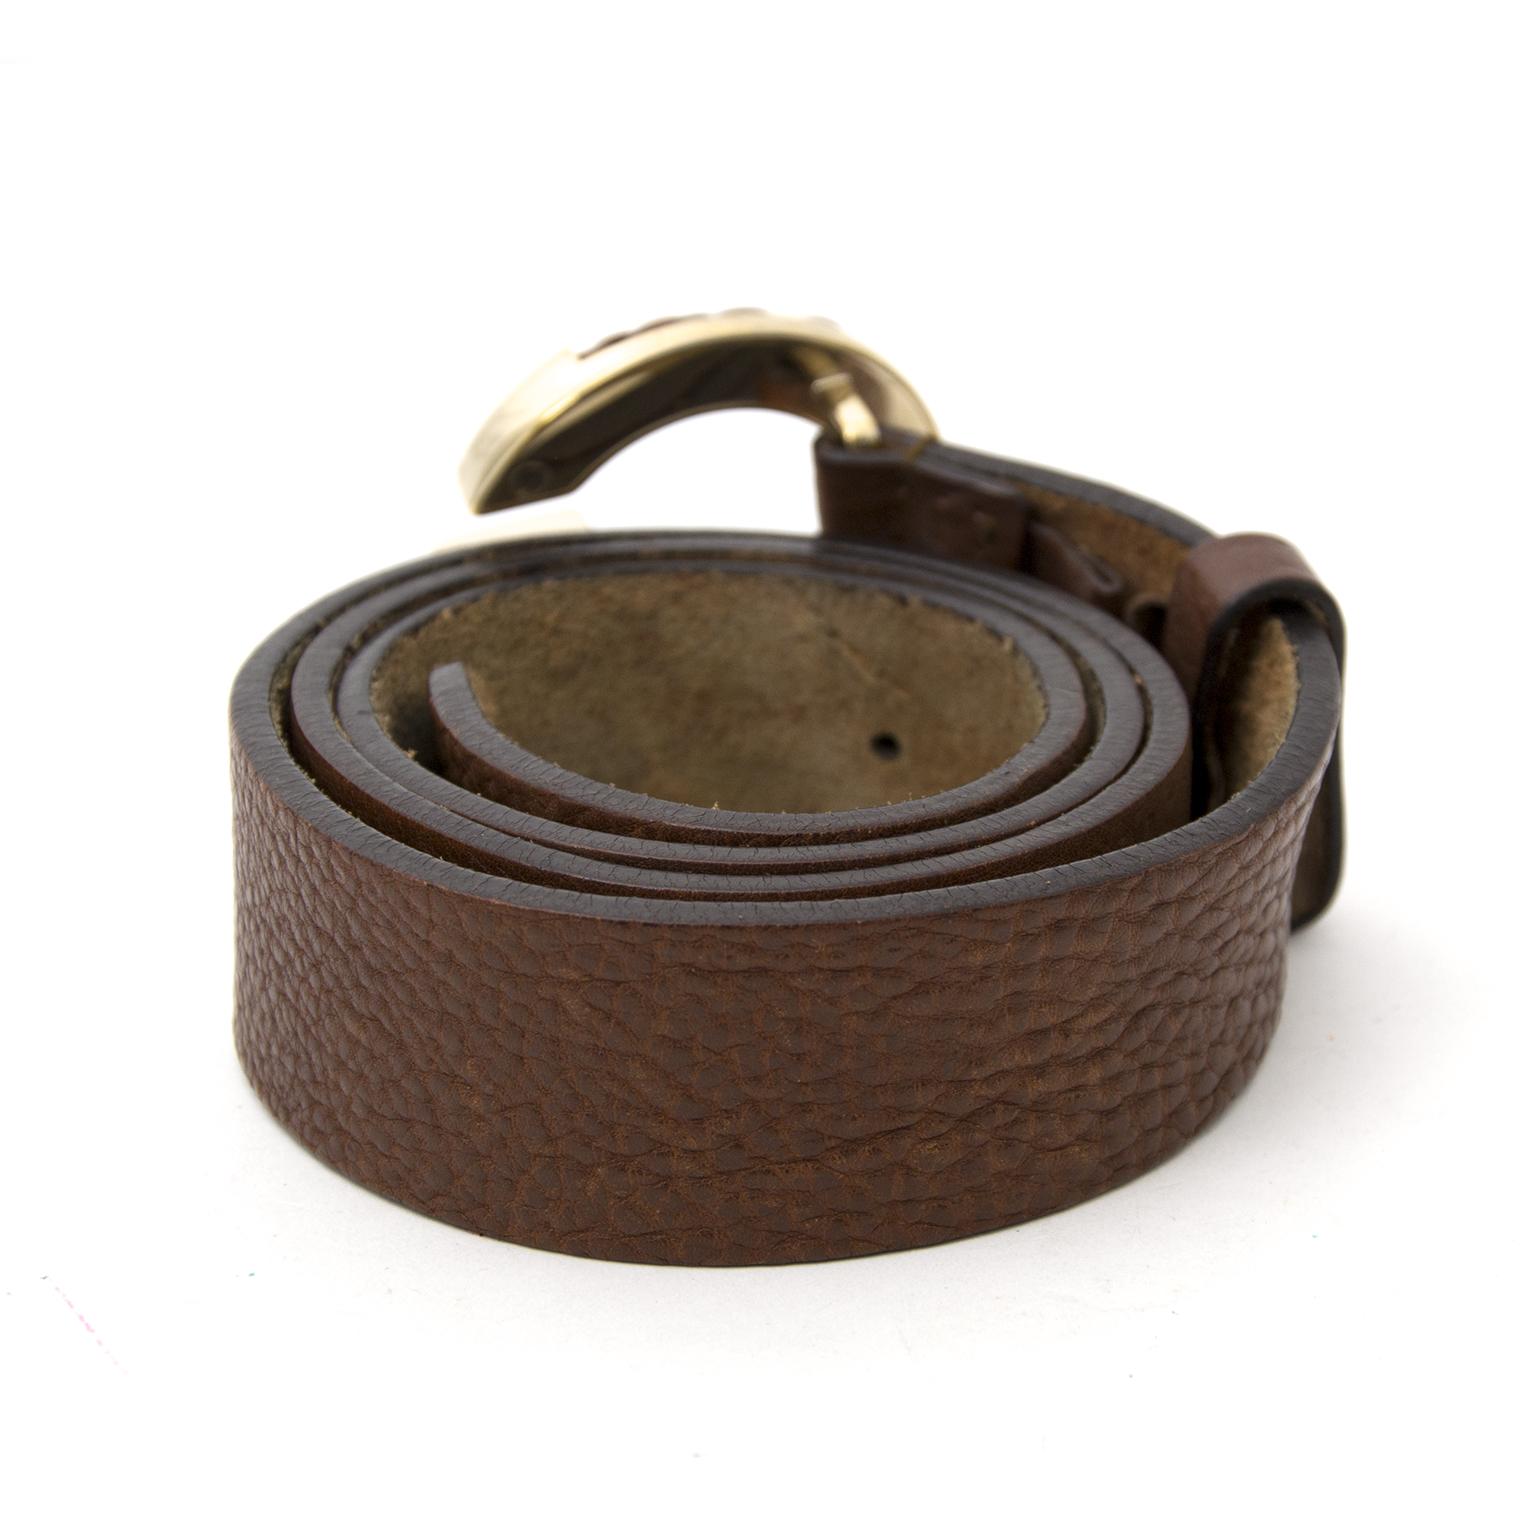 acheter enligne Gucci Woven G Belt aan de beste prijs Gucci Woven G Belt